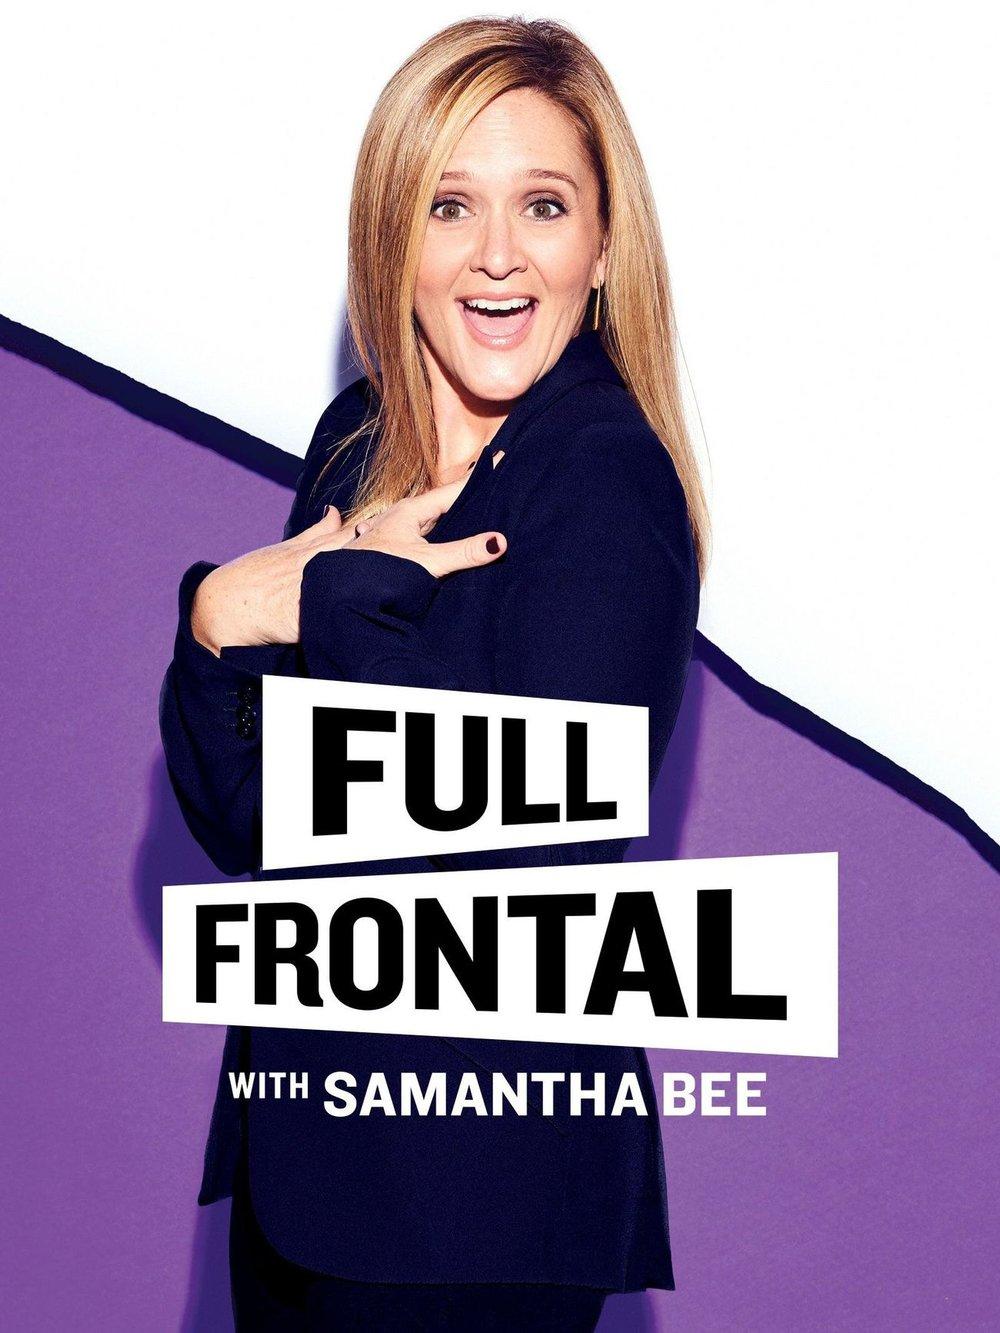 fullfrontal_season3.jpg